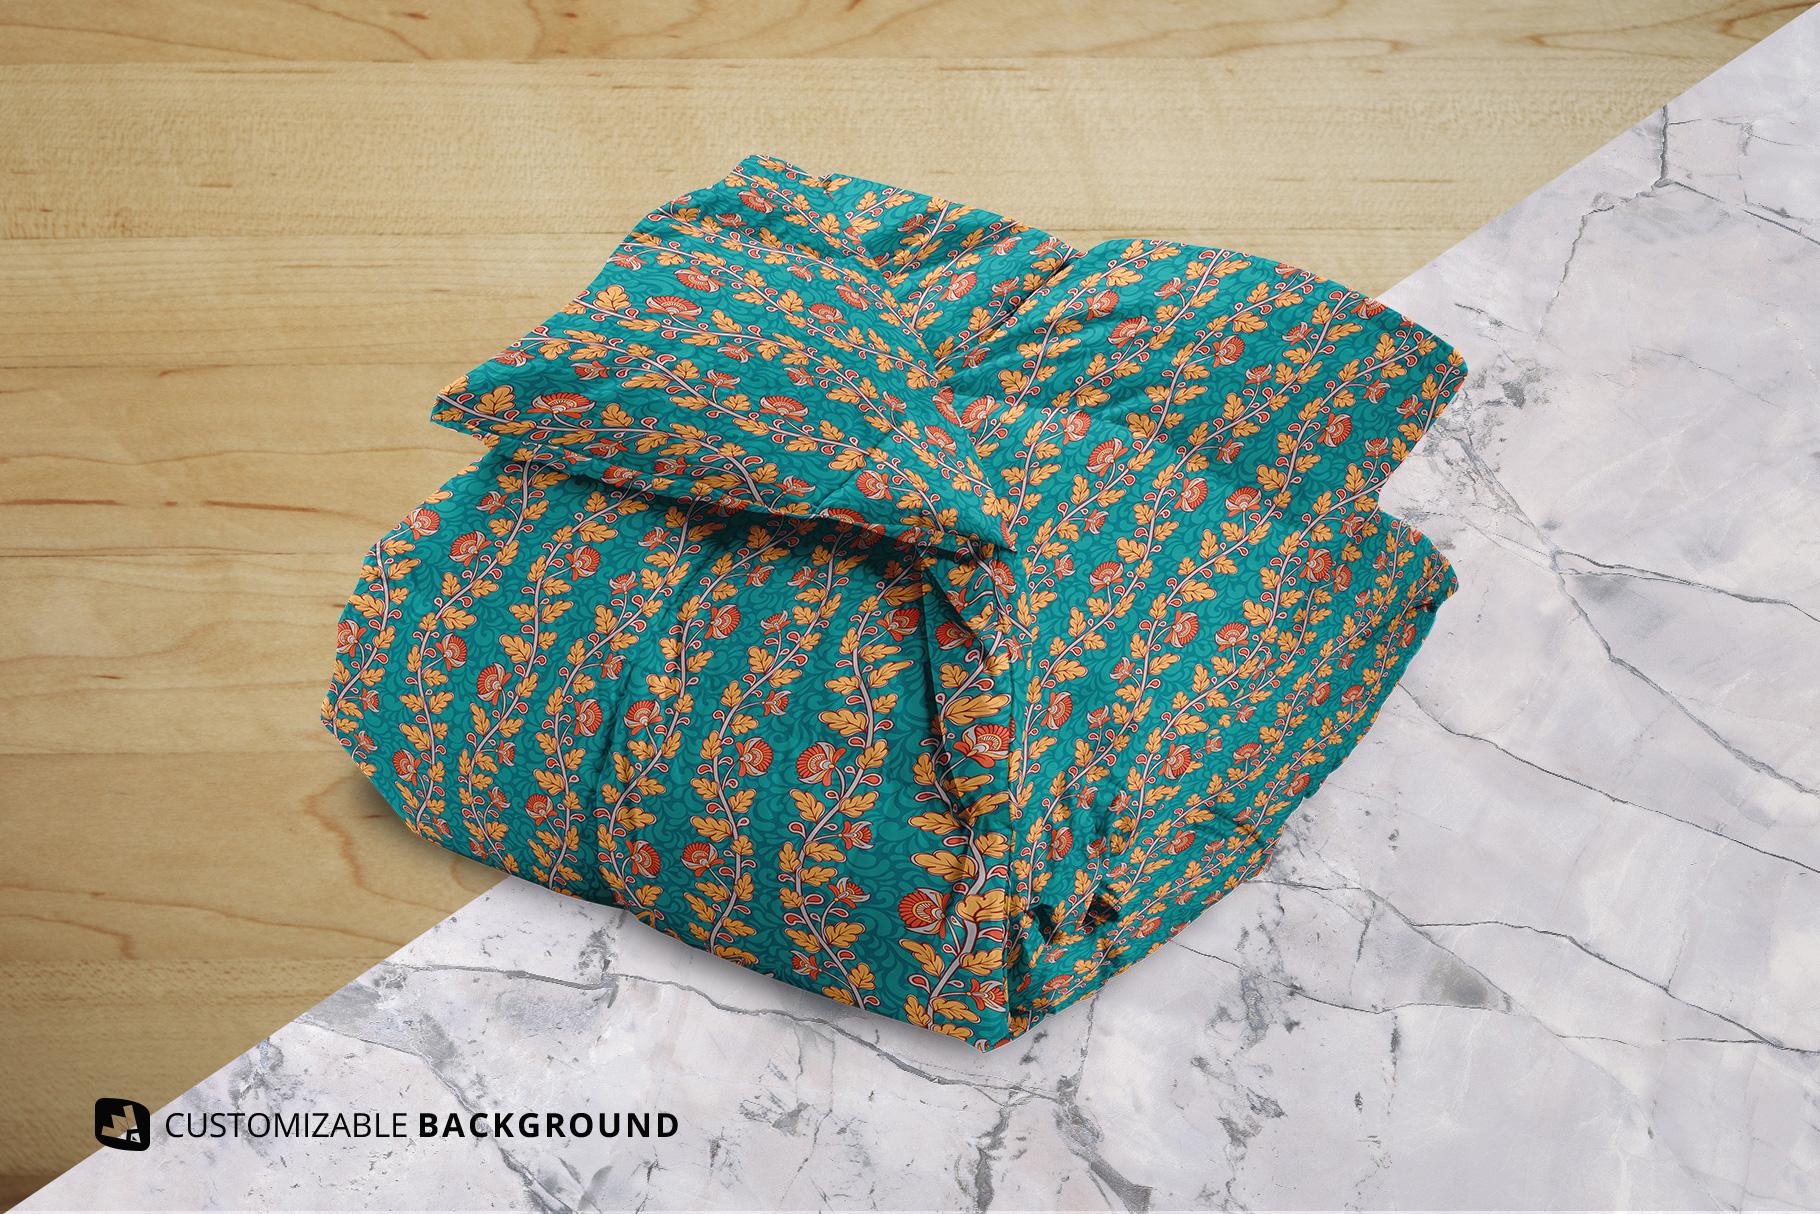 background options of the folded comforter blanket mockup